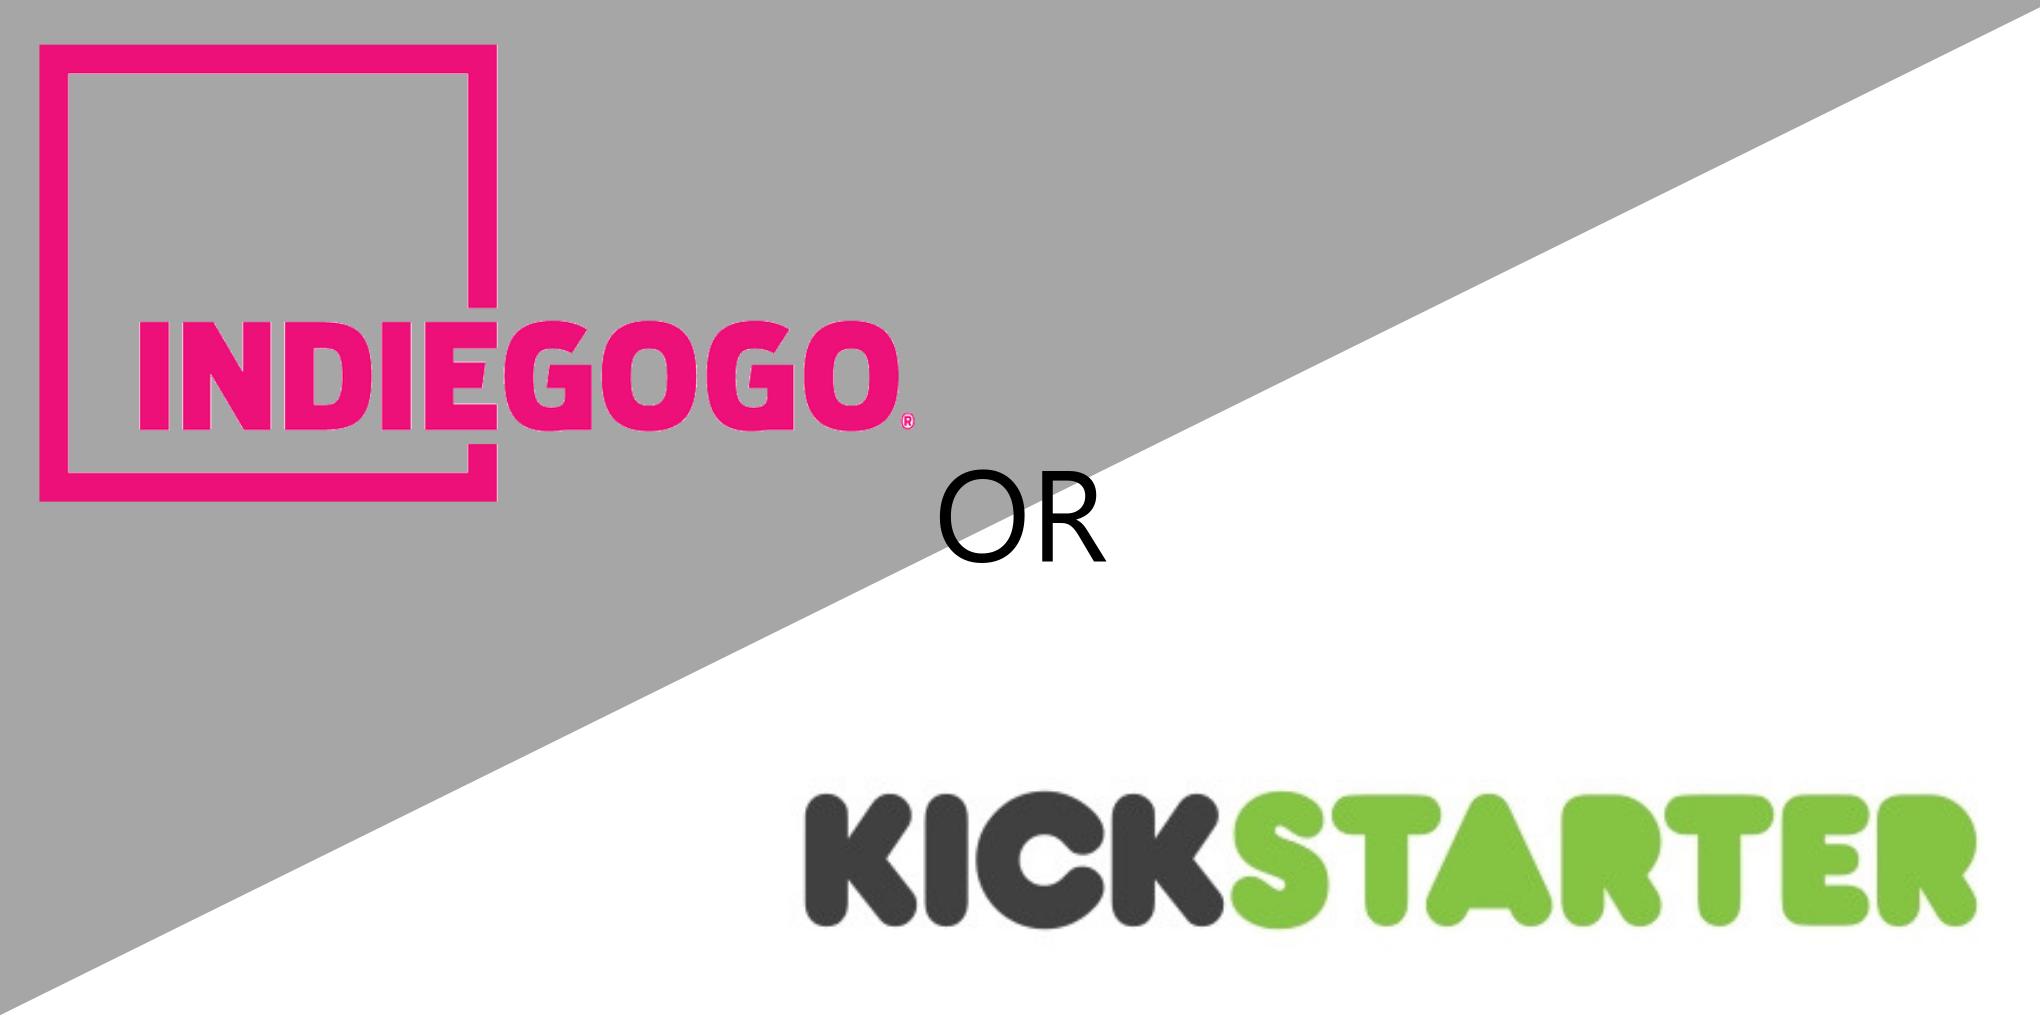 Crowdfunding, Choosing Indiegogo or Kickstarter?A Crowdfunding Infographic.